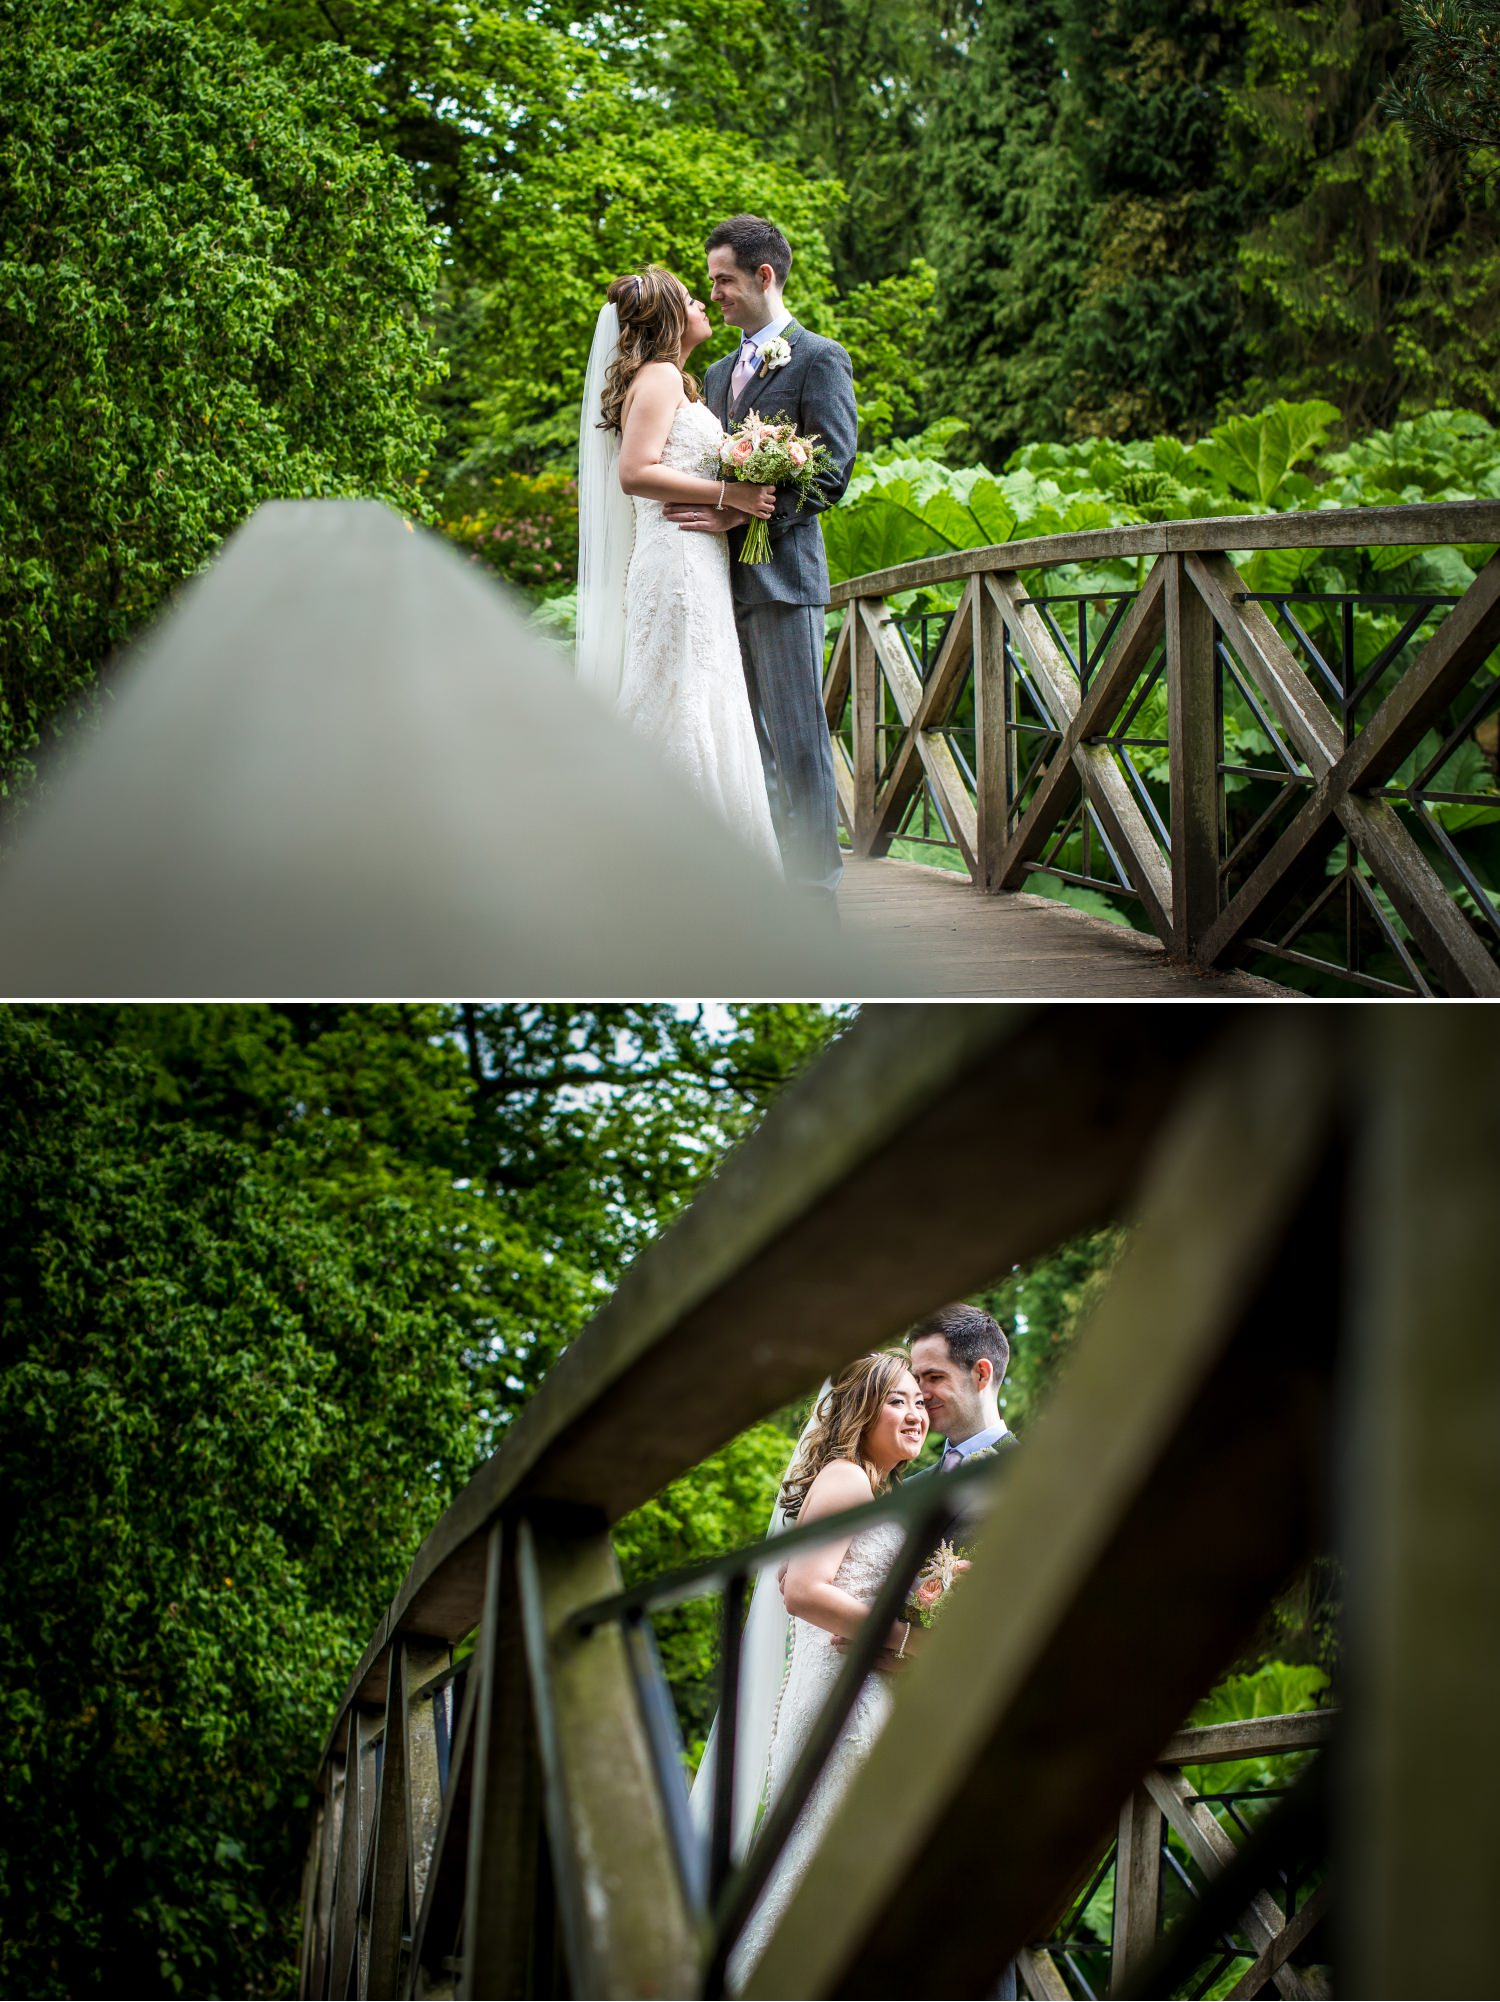 Wedding Photograph on bridge in Japanese gardens at Tatton Park